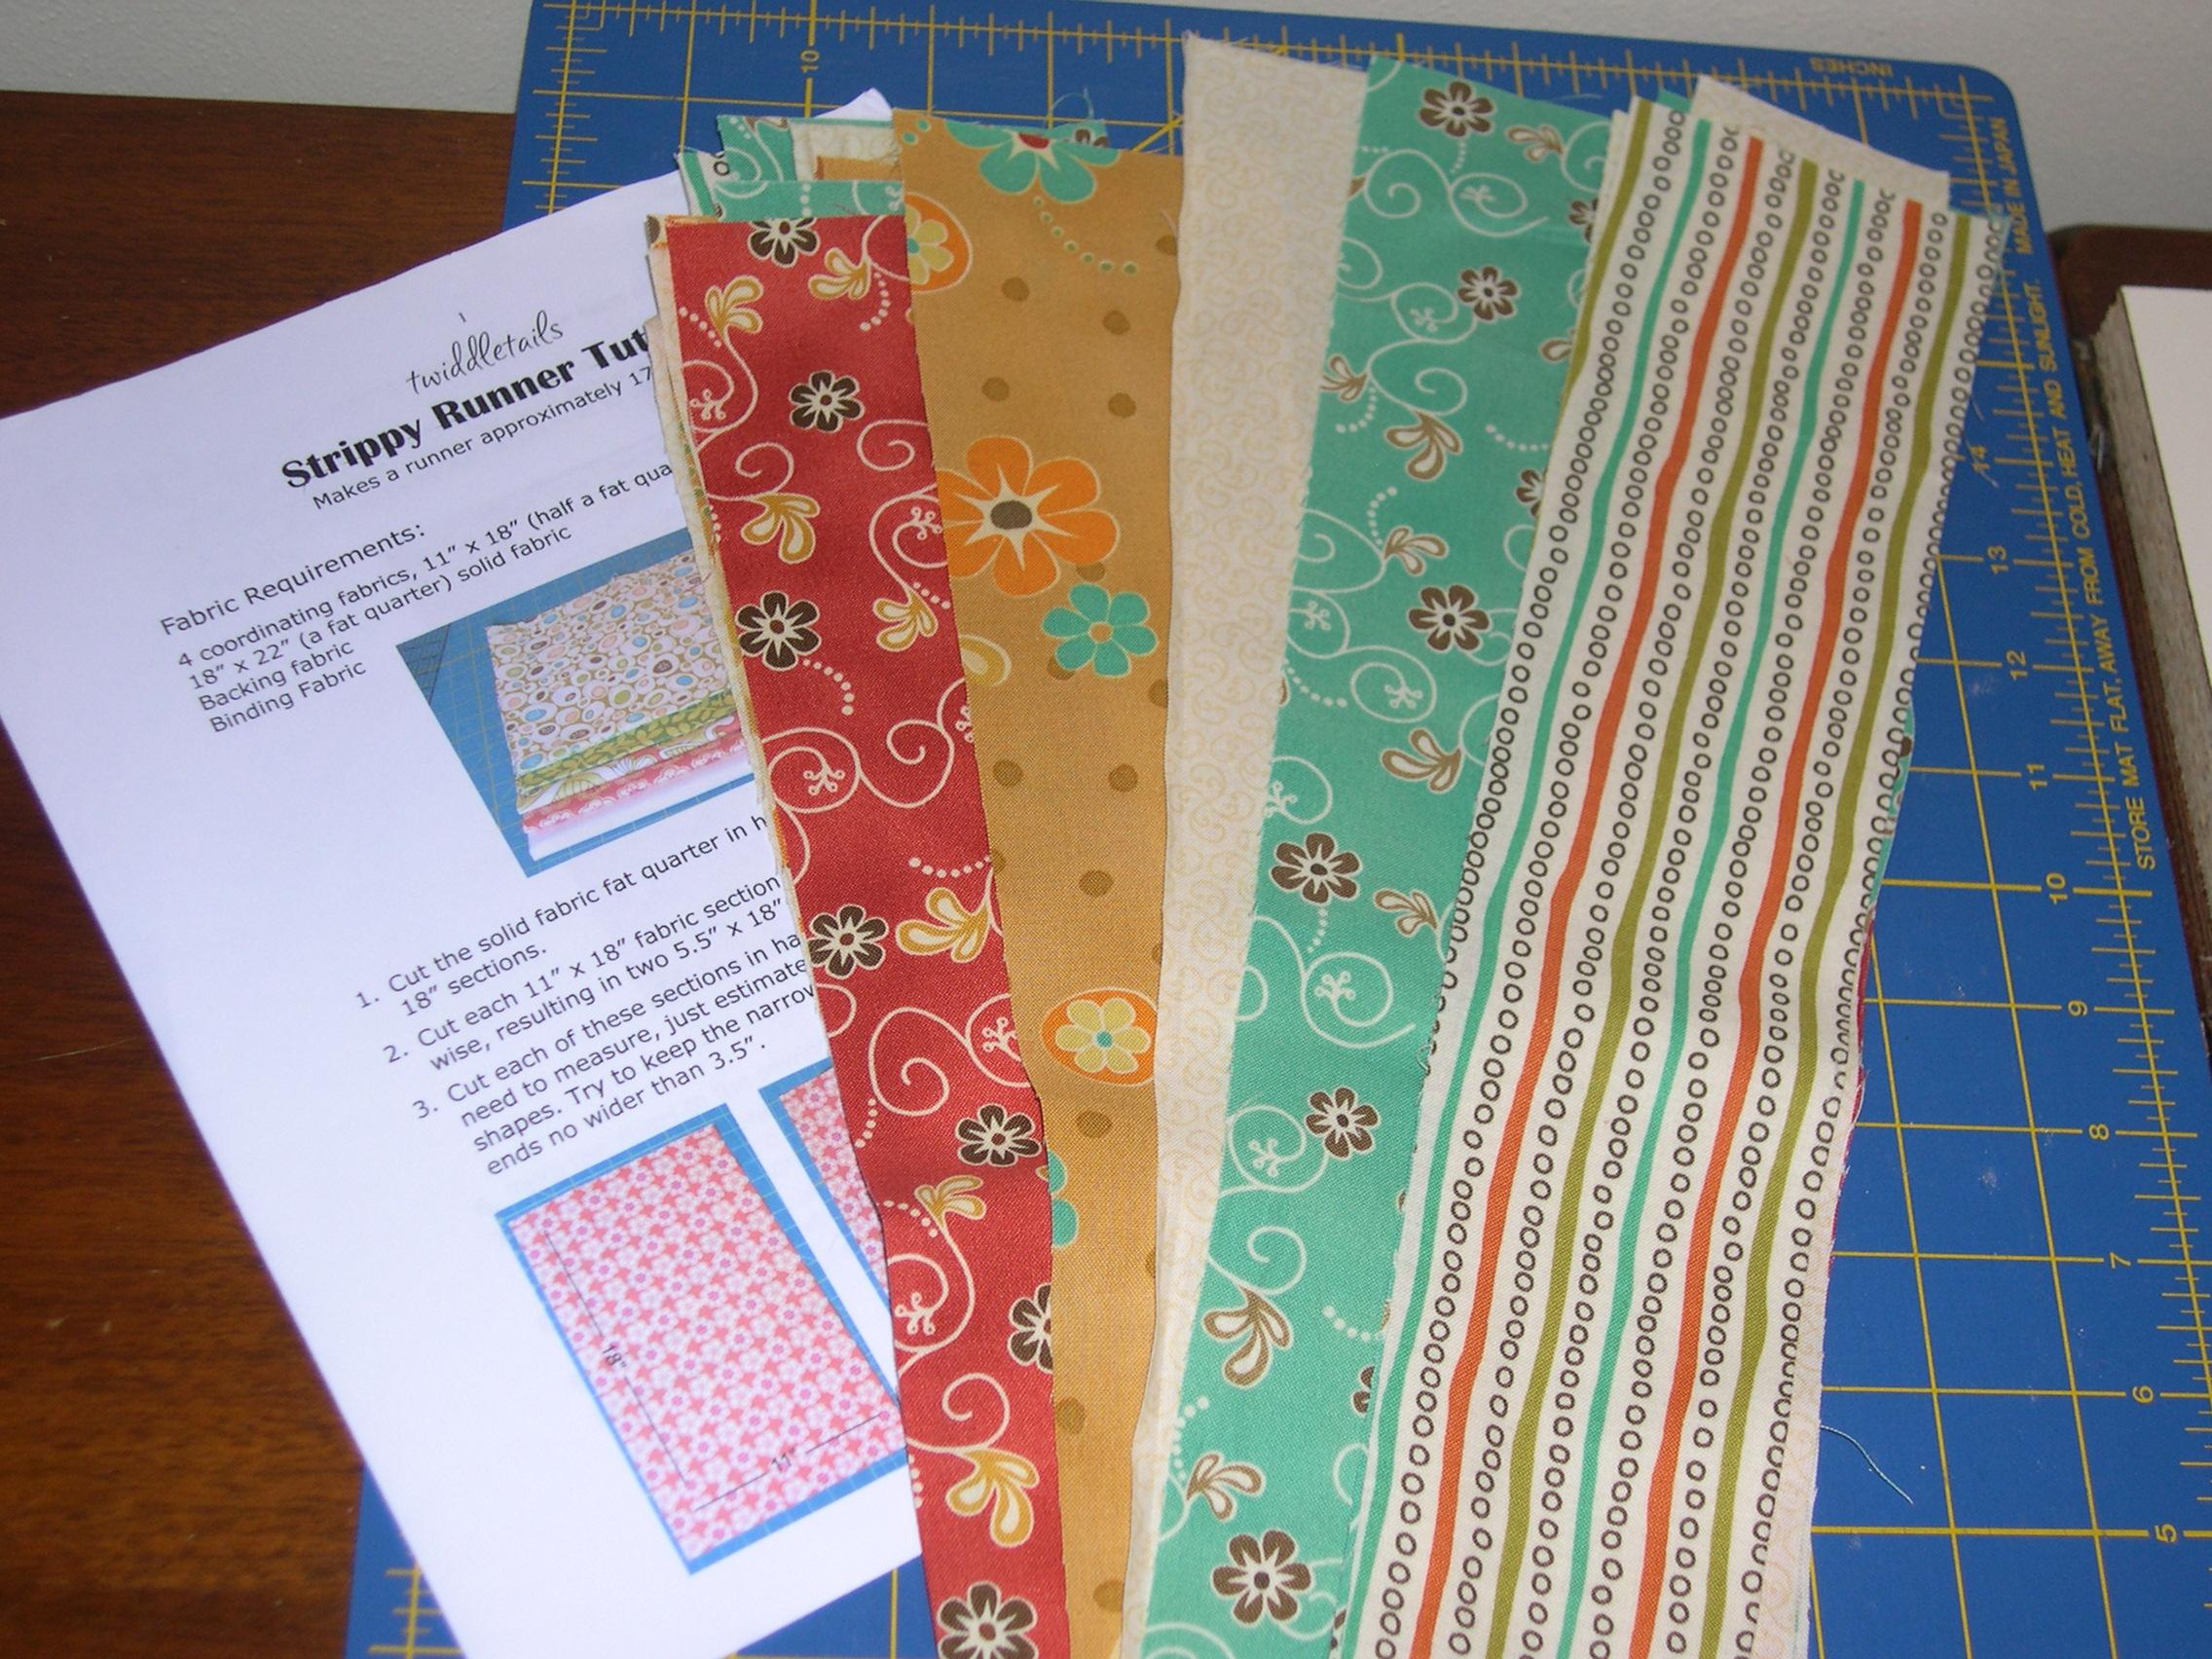 fabric strips for table runner